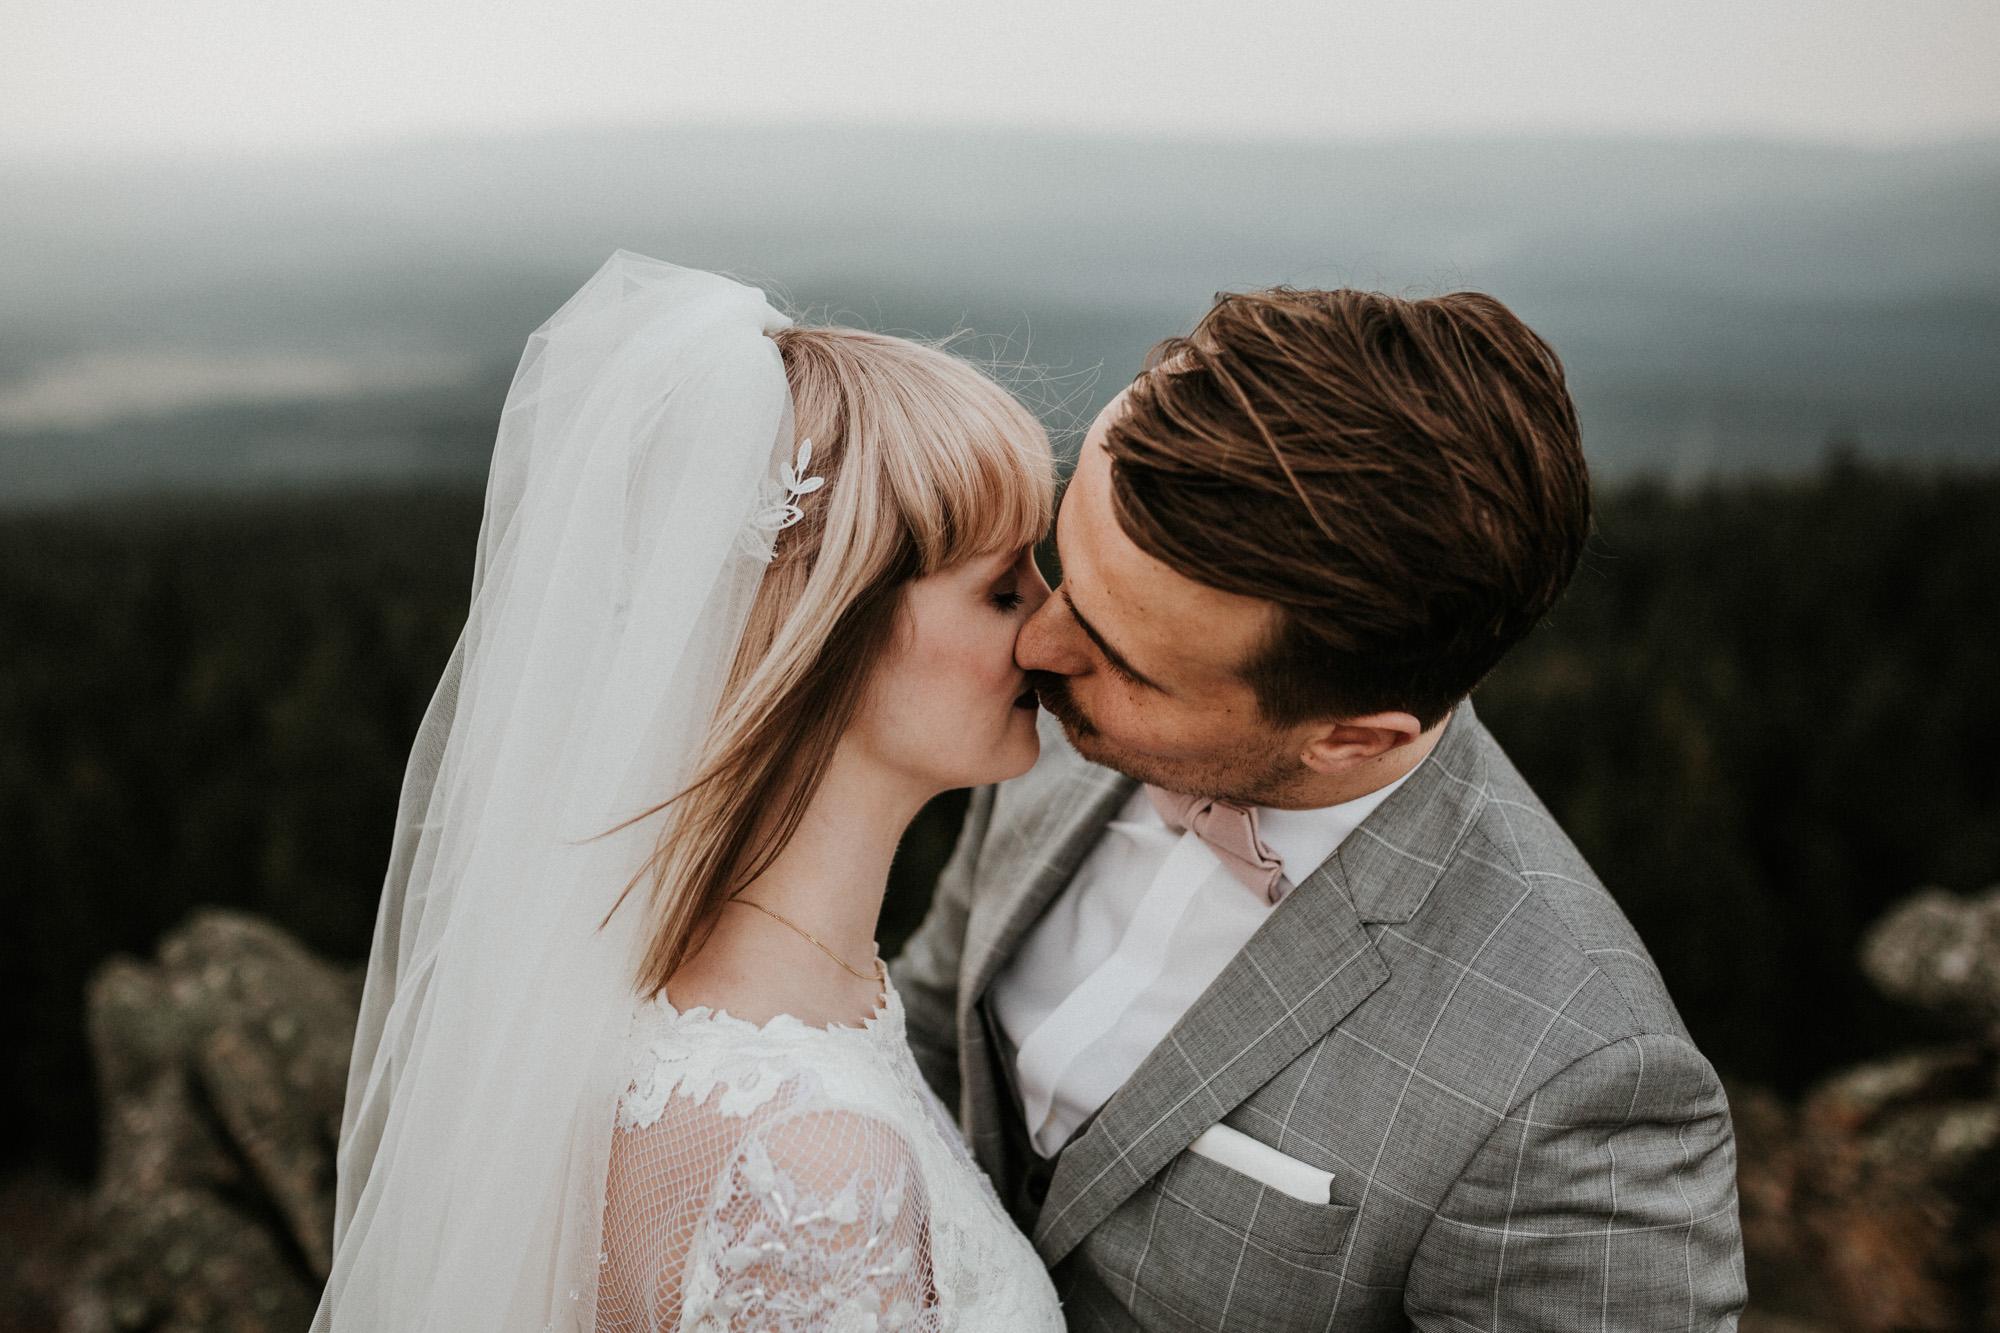 DanielaMarquardtPhotography_Hochzeitsfotograf_Düsseldorf_Köln_Mallorca_Bayern_Austria_Harz_LinaundMaik_Afterwedding-Shooting_Weddingphotographer_Ibiza_Tuskany_Italien_Toskana14